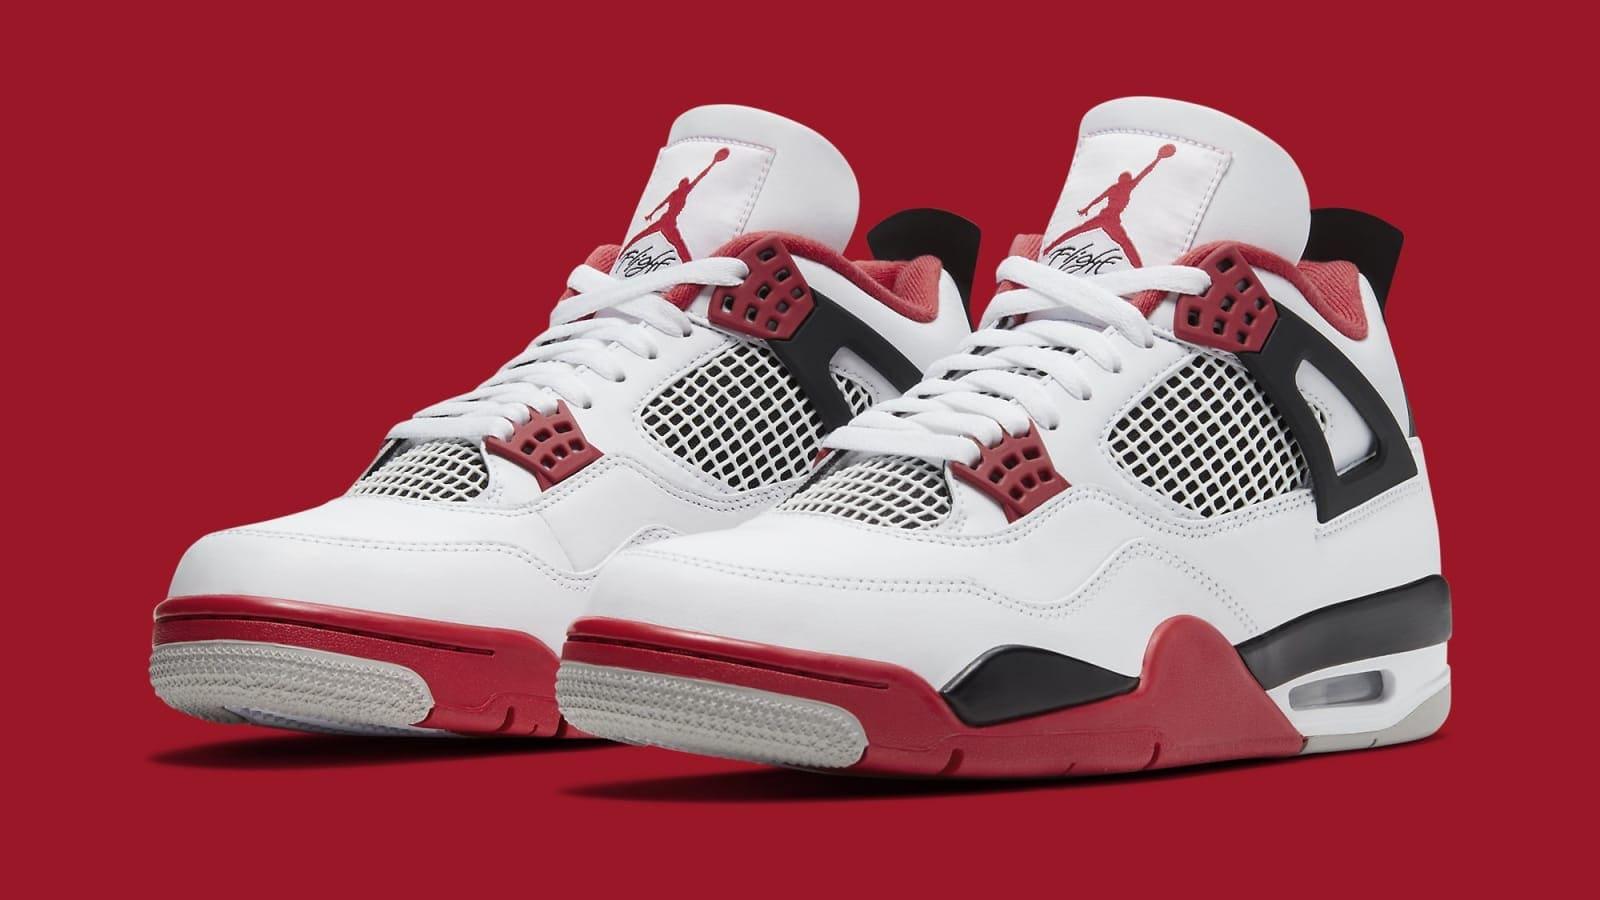 air jordan 4 iv fire red 2020 release date dc7770 160 pair